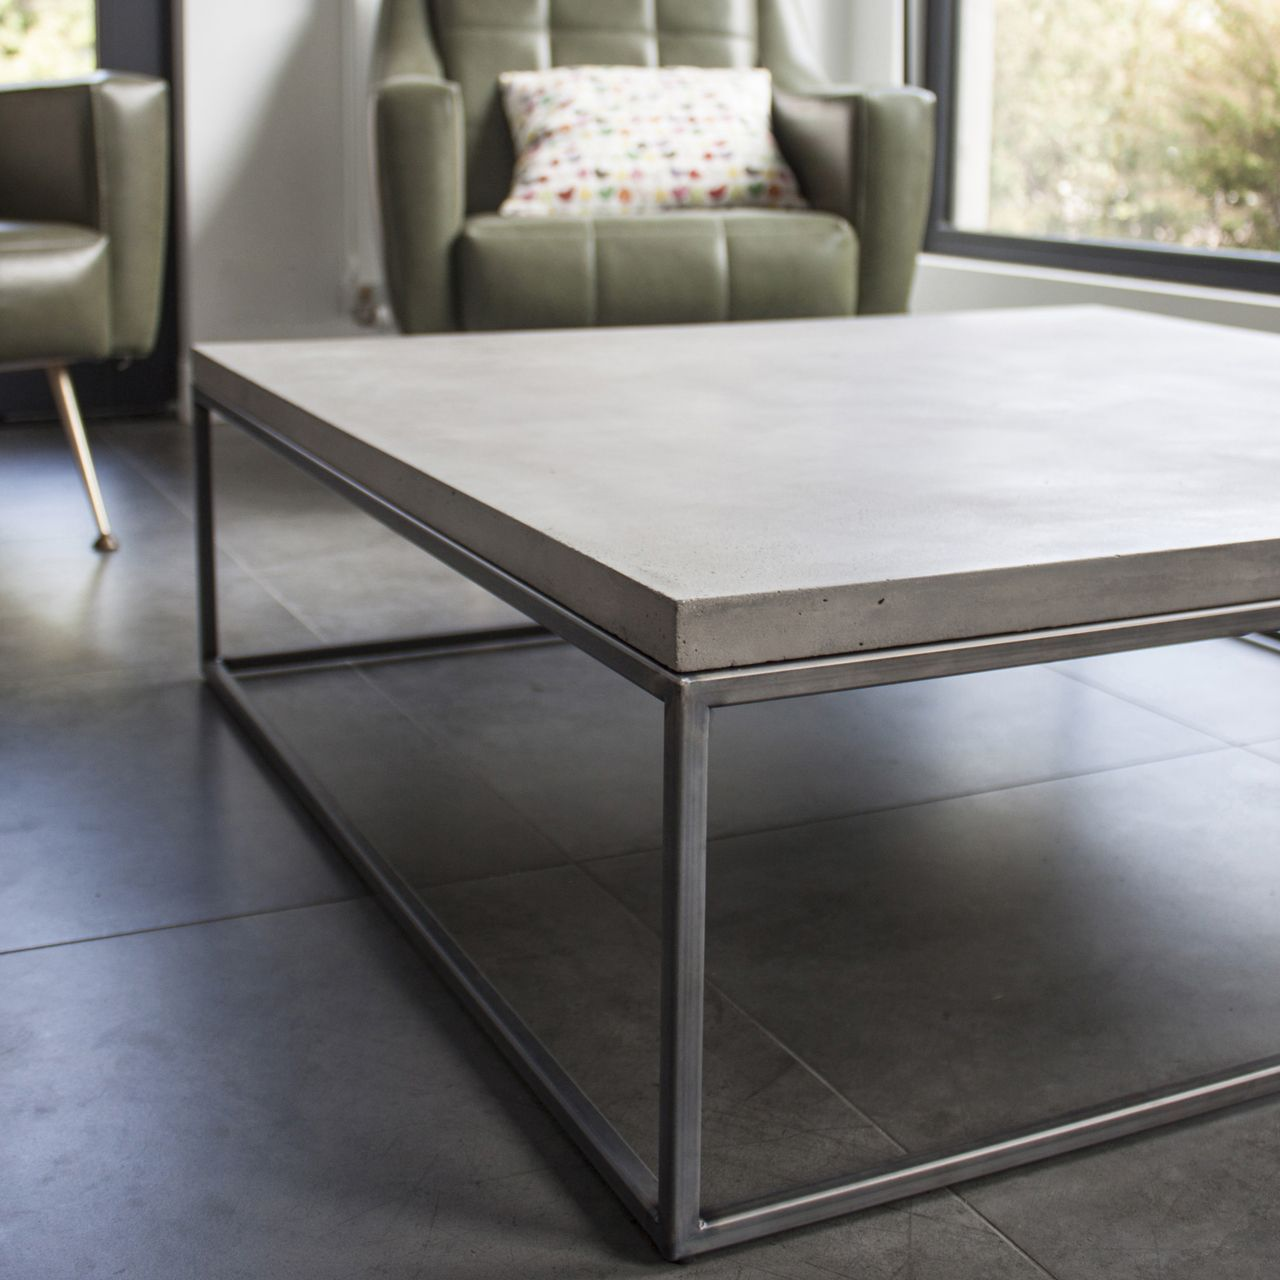 table basse en b ton et m tal perspective xl en 2019. Black Bedroom Furniture Sets. Home Design Ideas